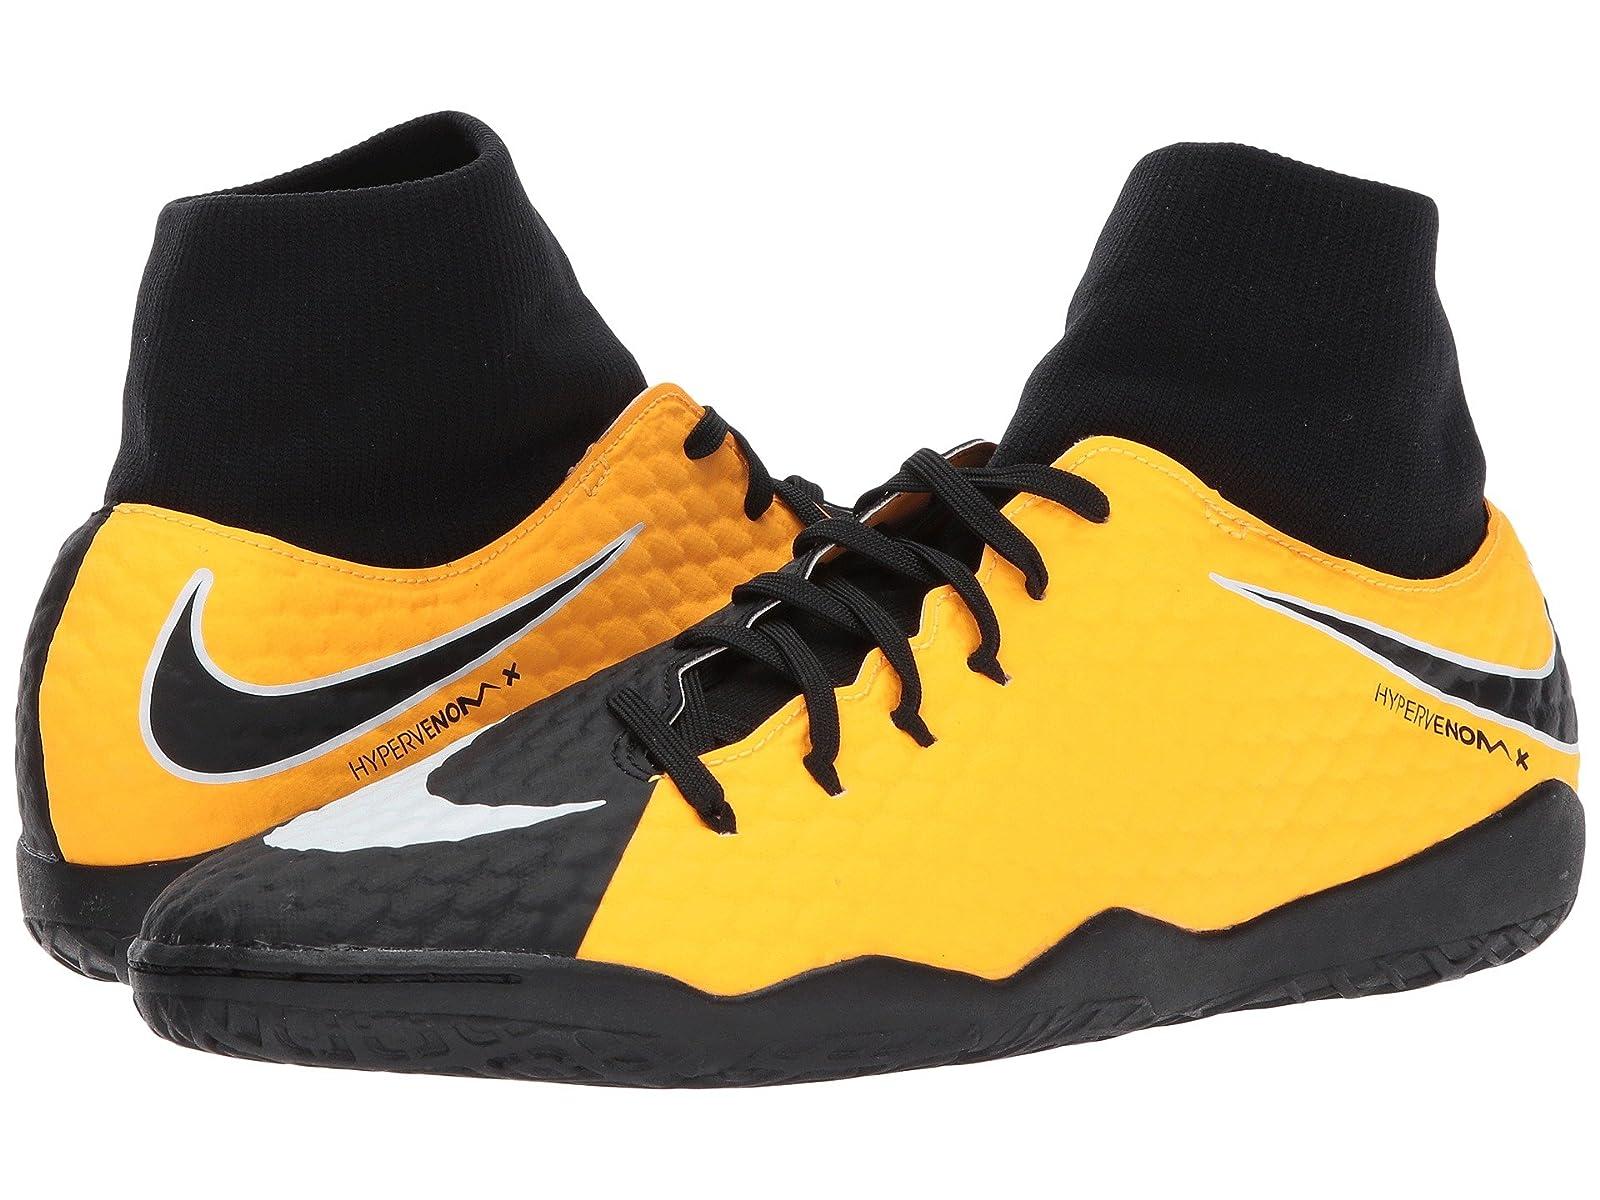 Nike HypervenomX Phelon III Dynamic Fit ICCheap and distinctive eye-catching shoes